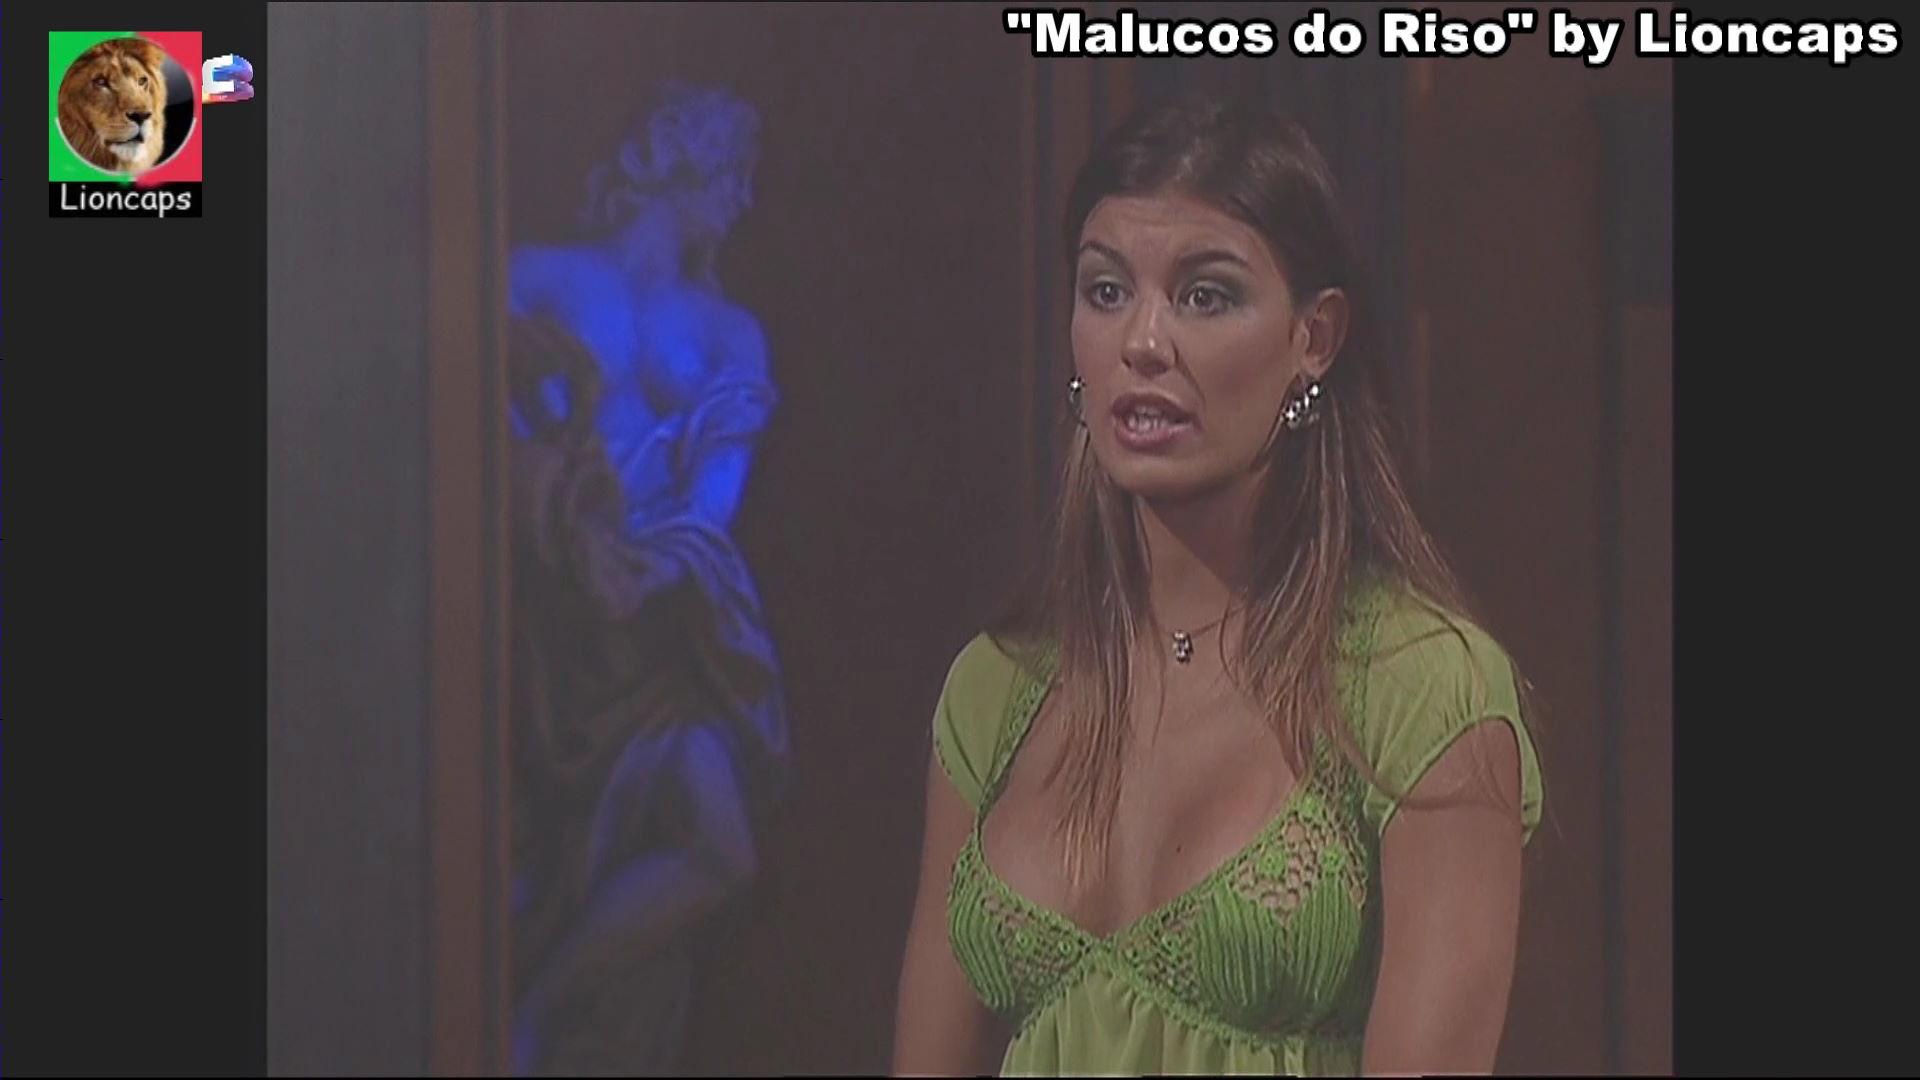 475099331_malucos_riso_alda_gomes_vs190malucos_riso_602_15030_122_479lo.JPG